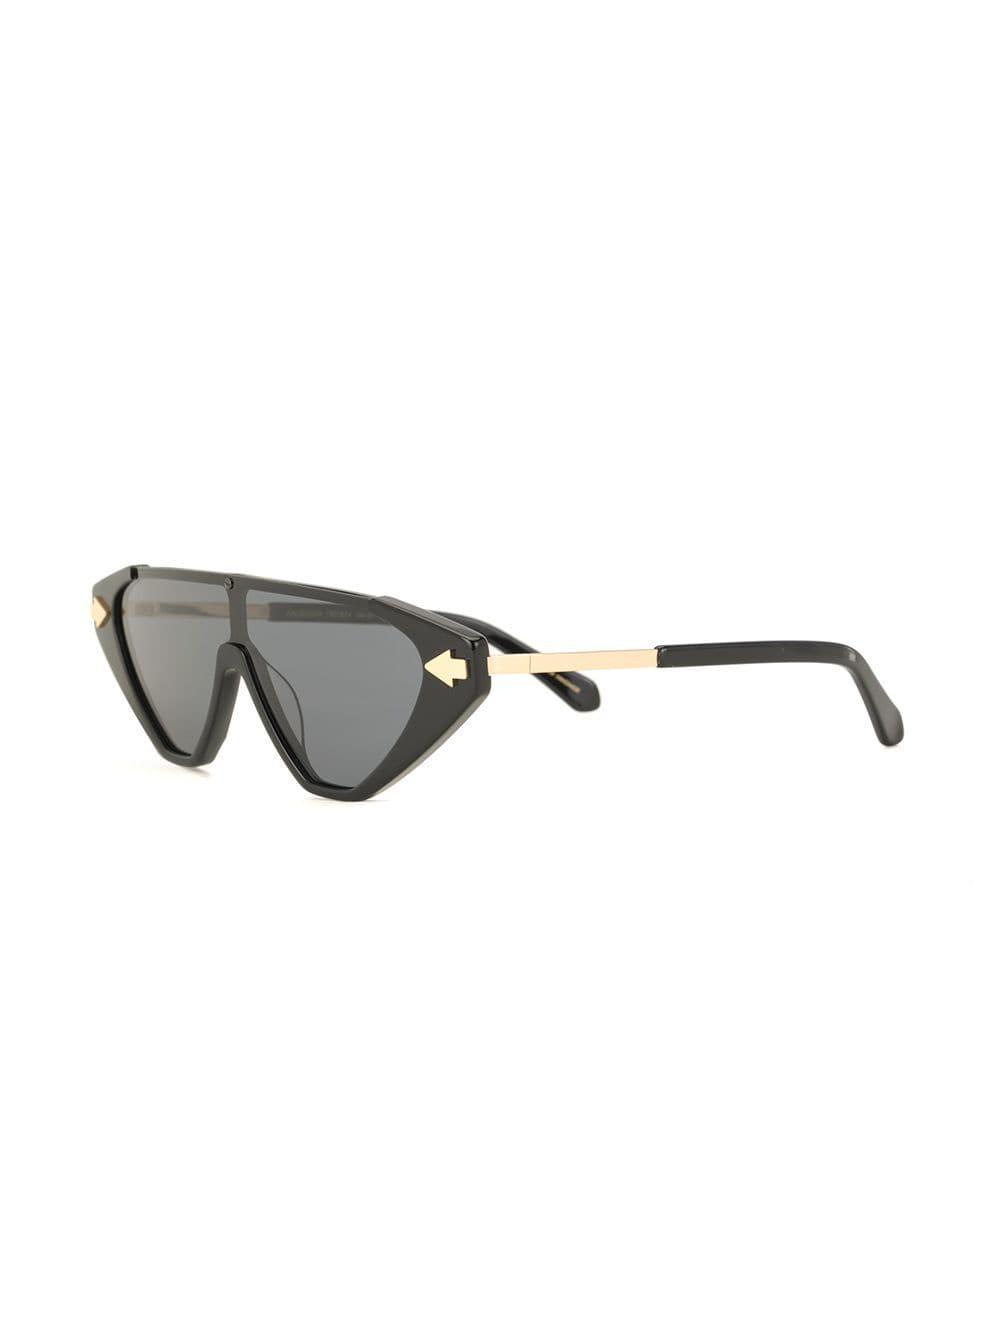 5a681d216cb2 Karen Walker Hallelujah Shield Sunglasses in Black - Lyst